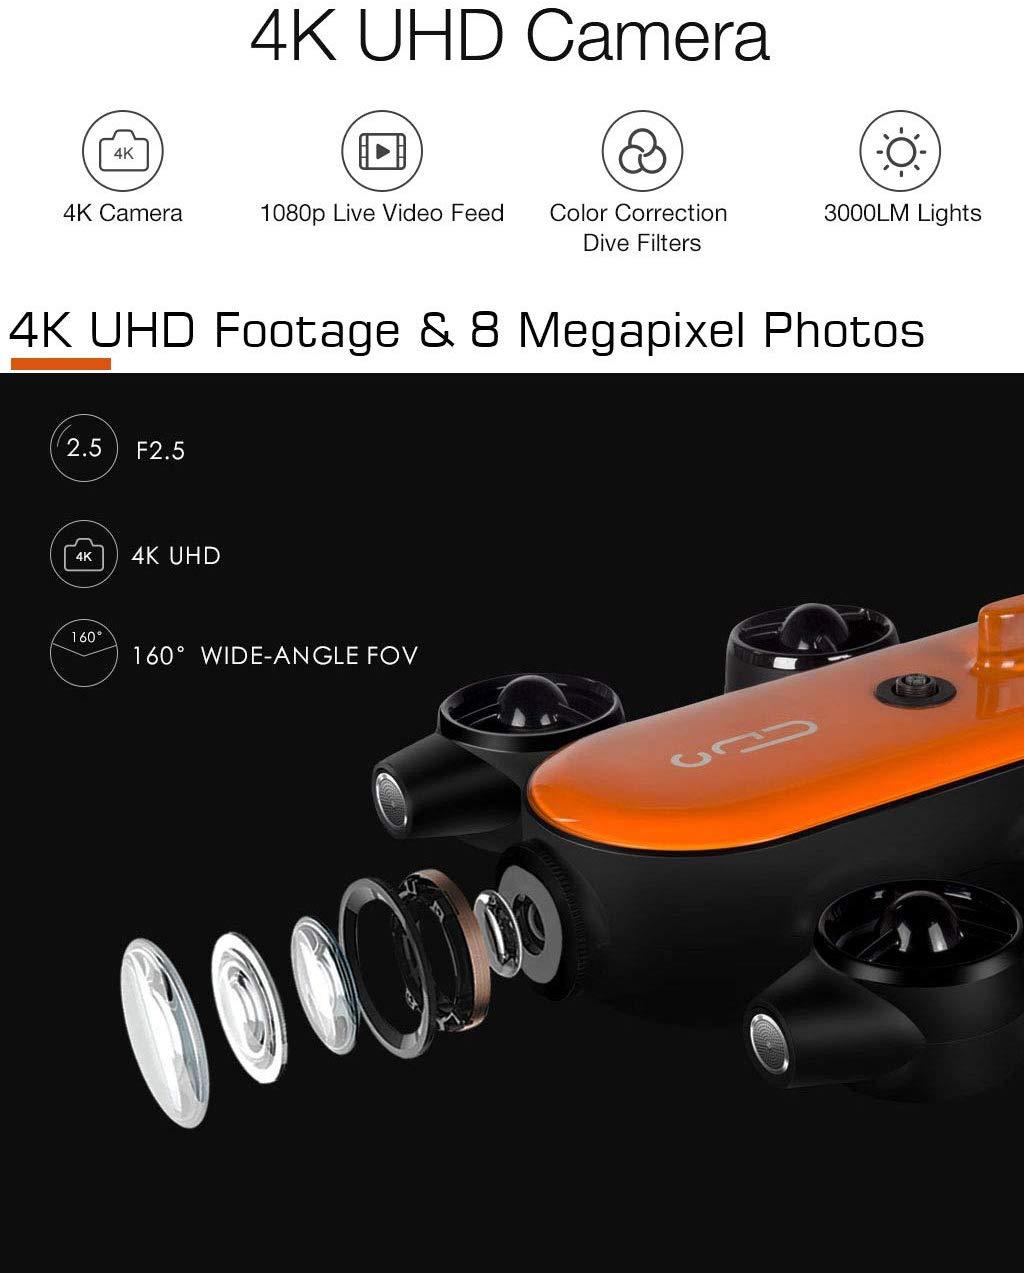 underwater drones for sale titan 2 image